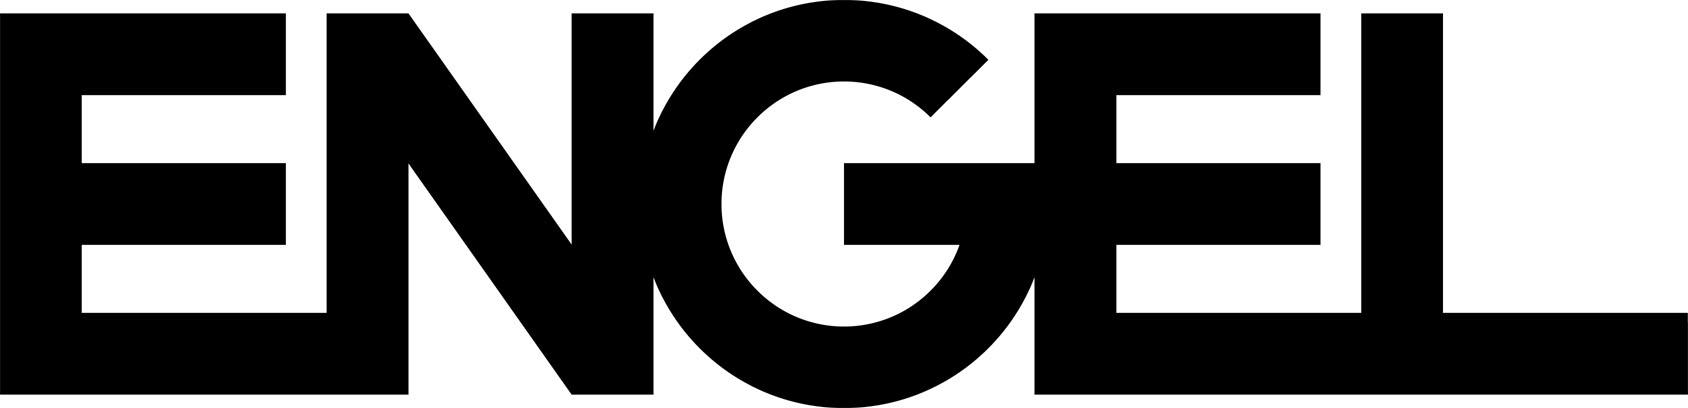 ENGEL_Logo_Schwarz_150dpi